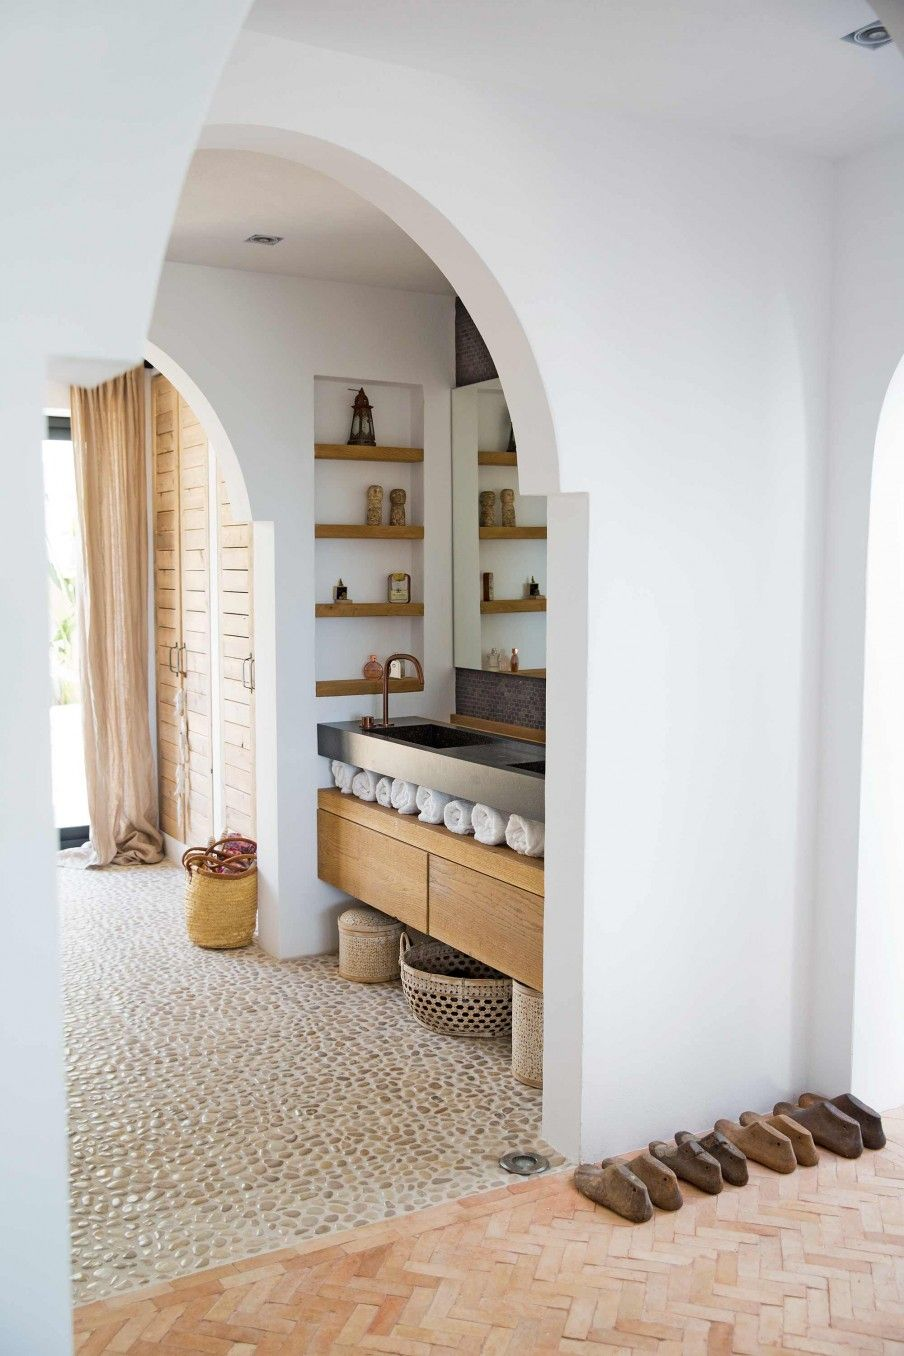 Bad ka design houten badkamermeubel  wooden bathroom furniture  vtwonen